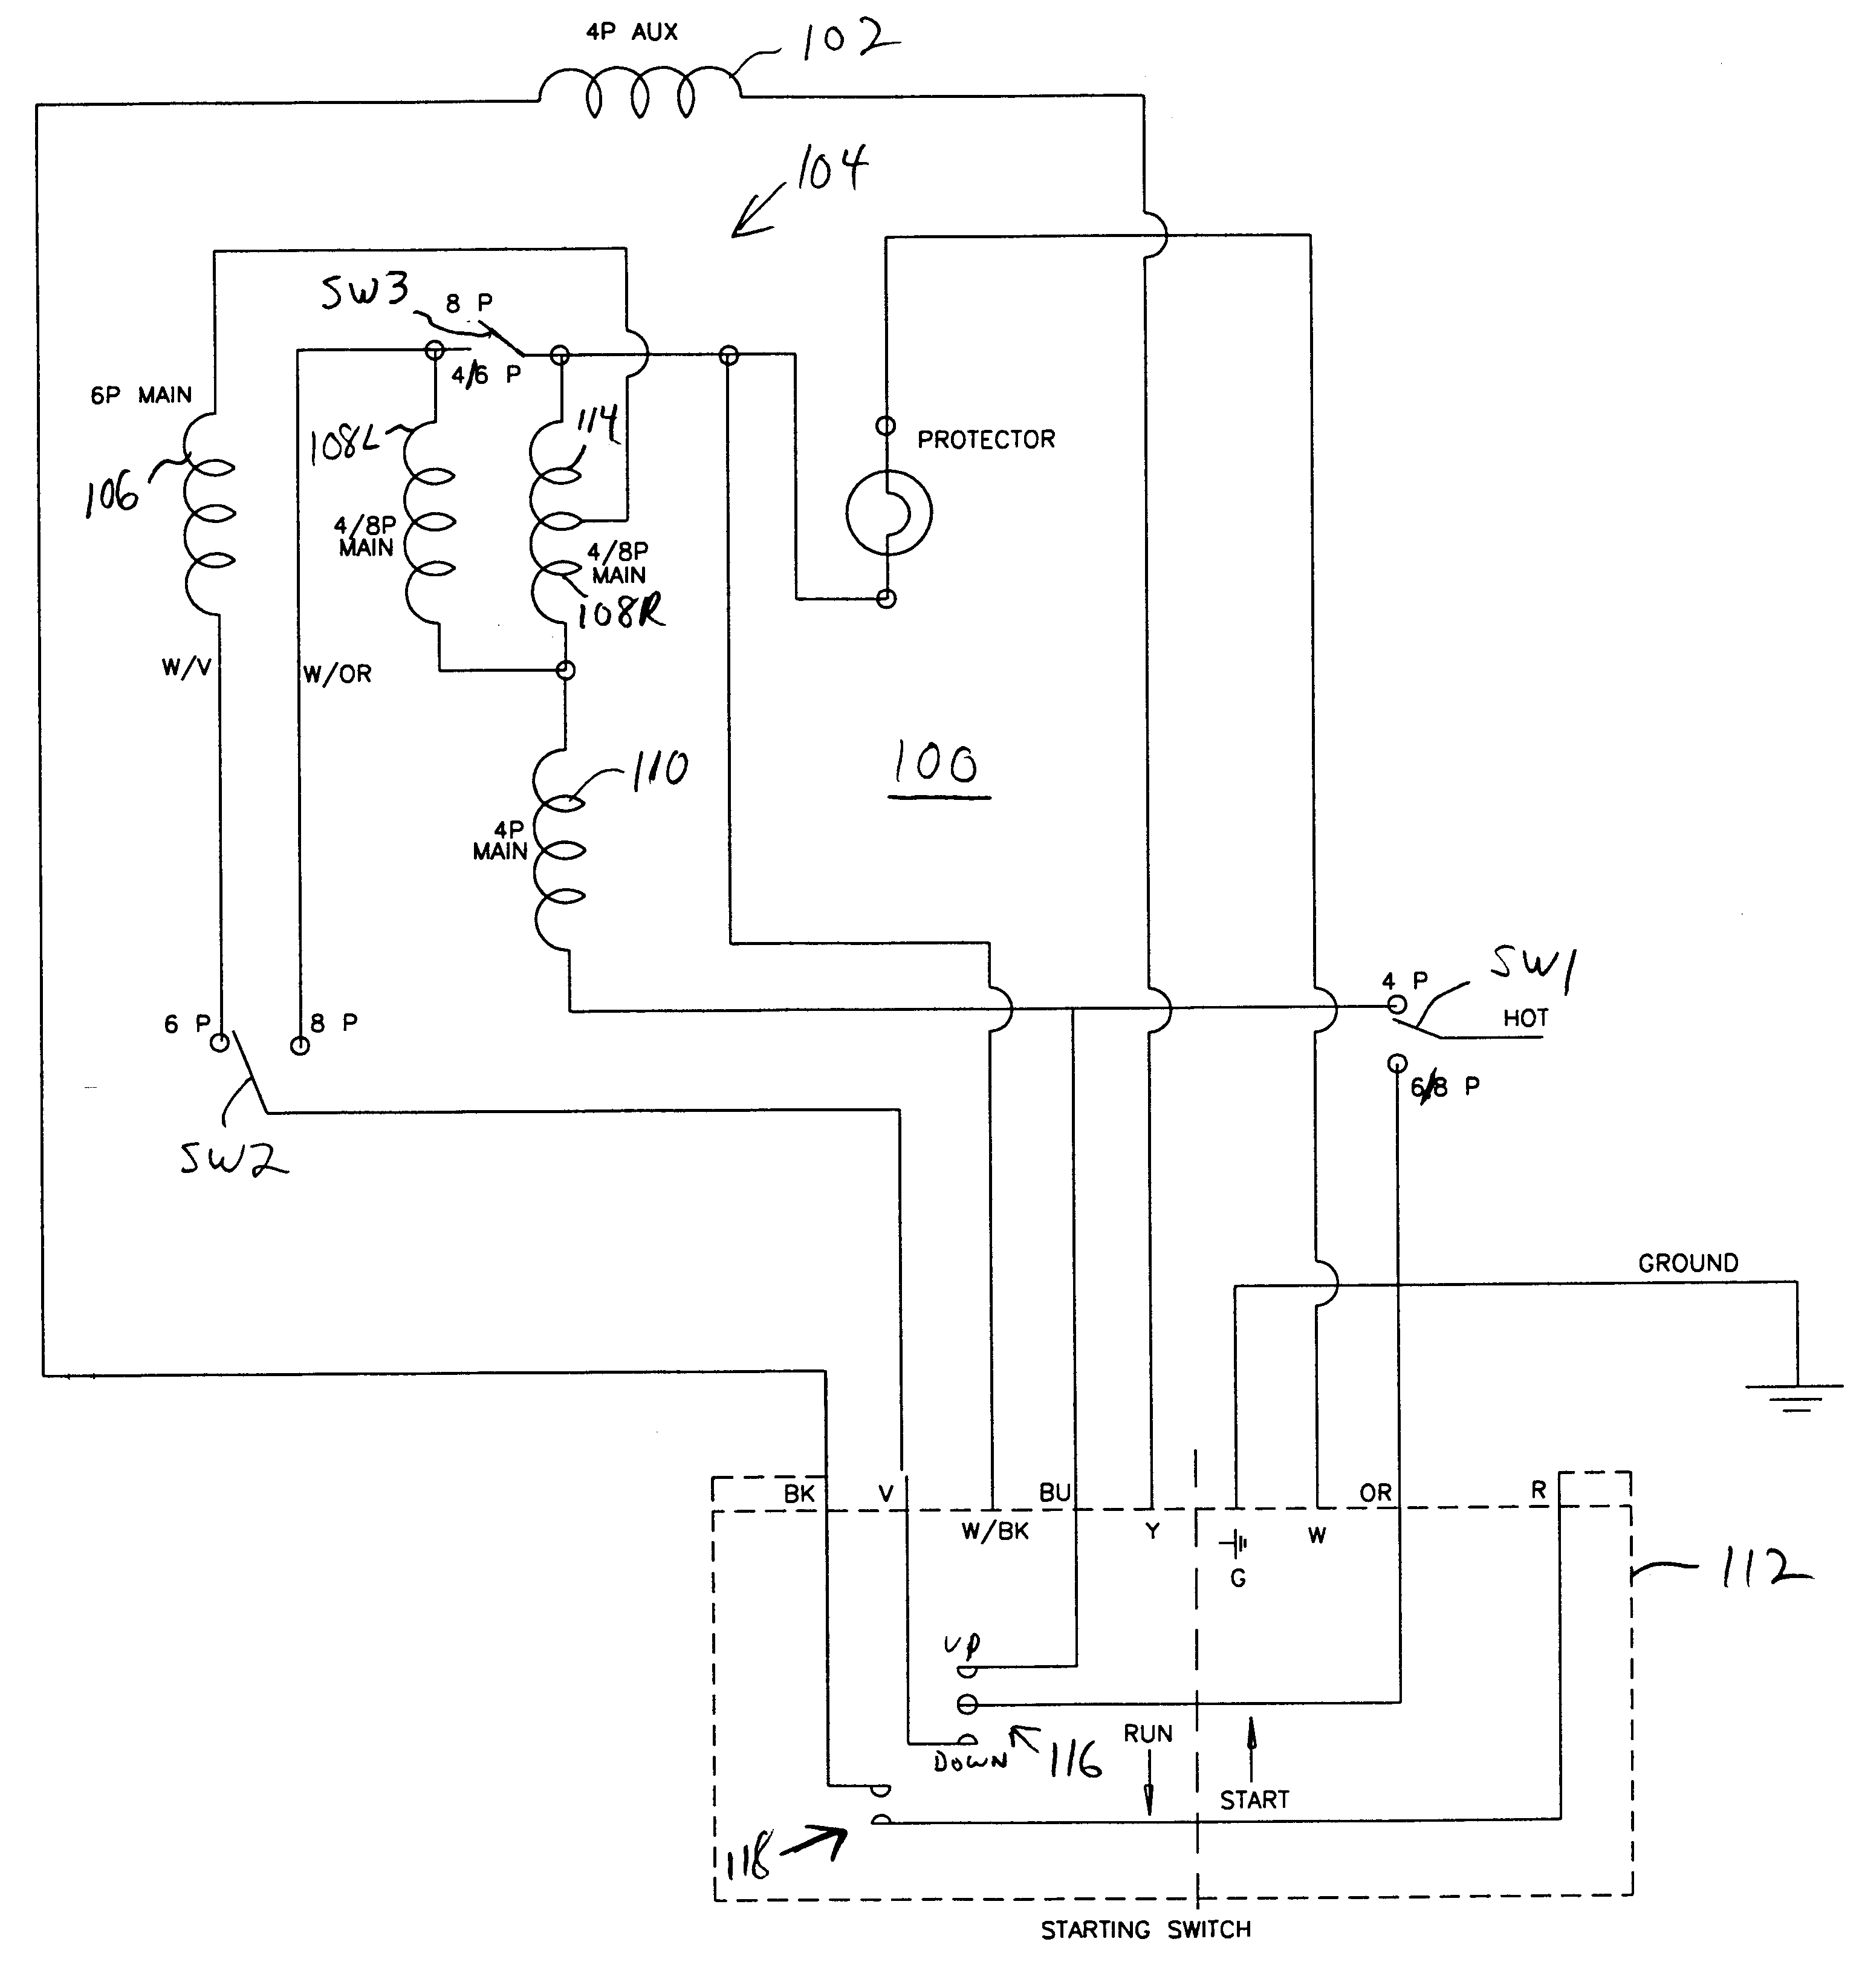 Emerson Jacuzzi Wiring Schematics | Manual E-Books - Emerson Electric Motors Wiring Diagram